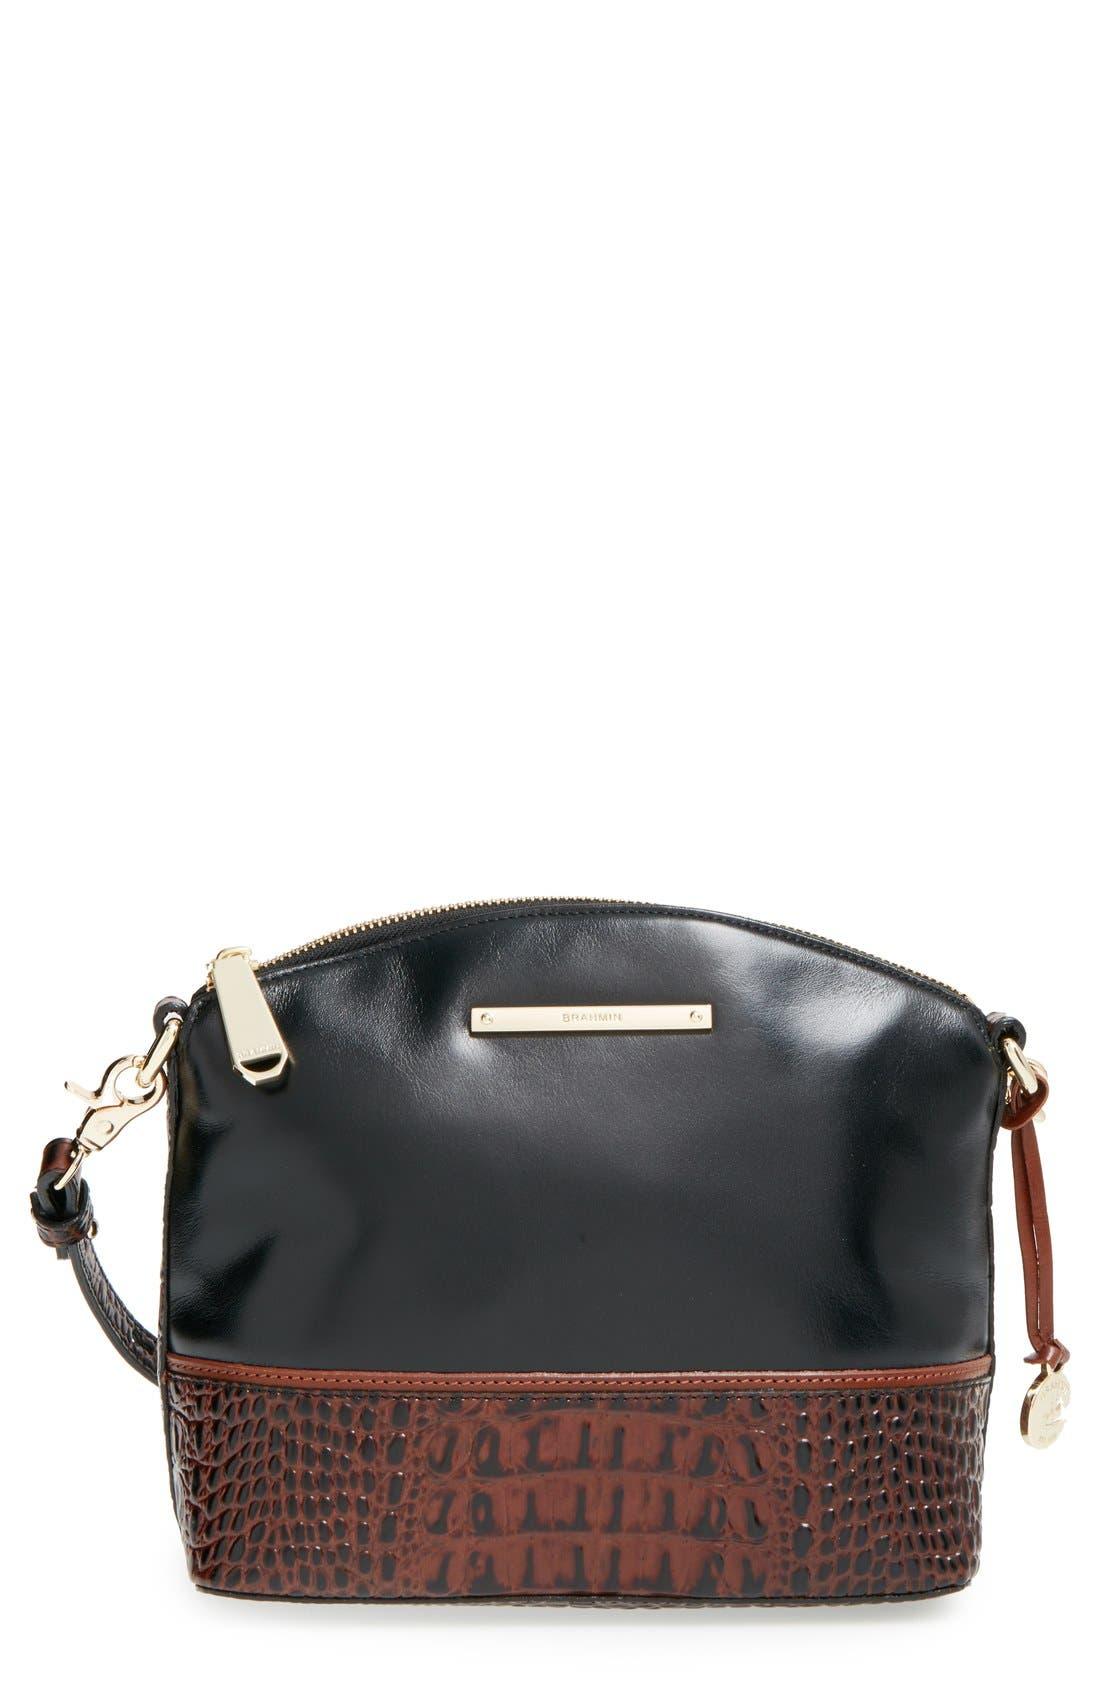 Main Image - Brahmin 'Mini Duxbury' Crossbody Bag